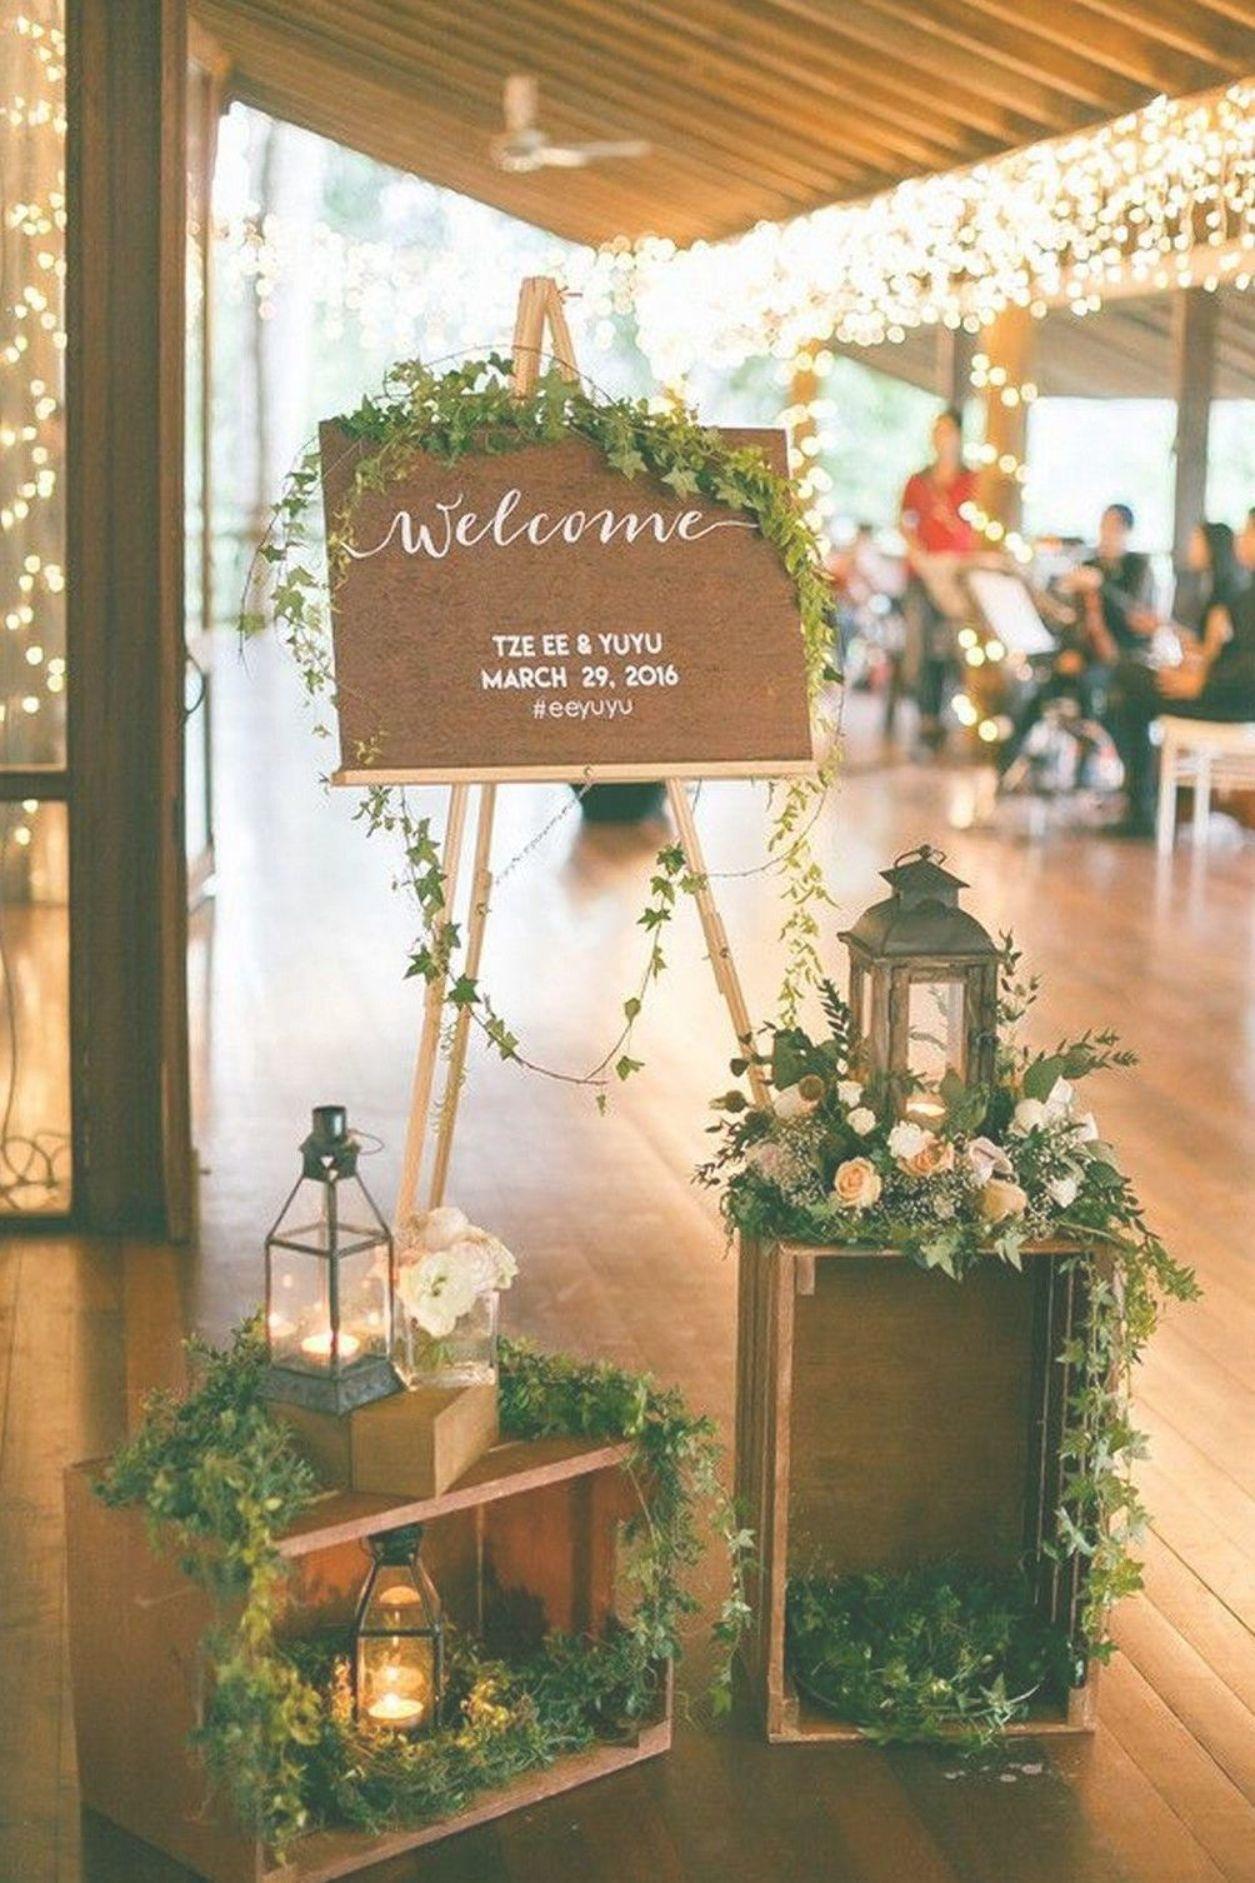 35 Best Vintage Wedding Ideas That Won T Break Your Budget Wedding Homedecoraccess Cheap Wedding Decorations Wedding Reception Entrance Wedding Table Themes